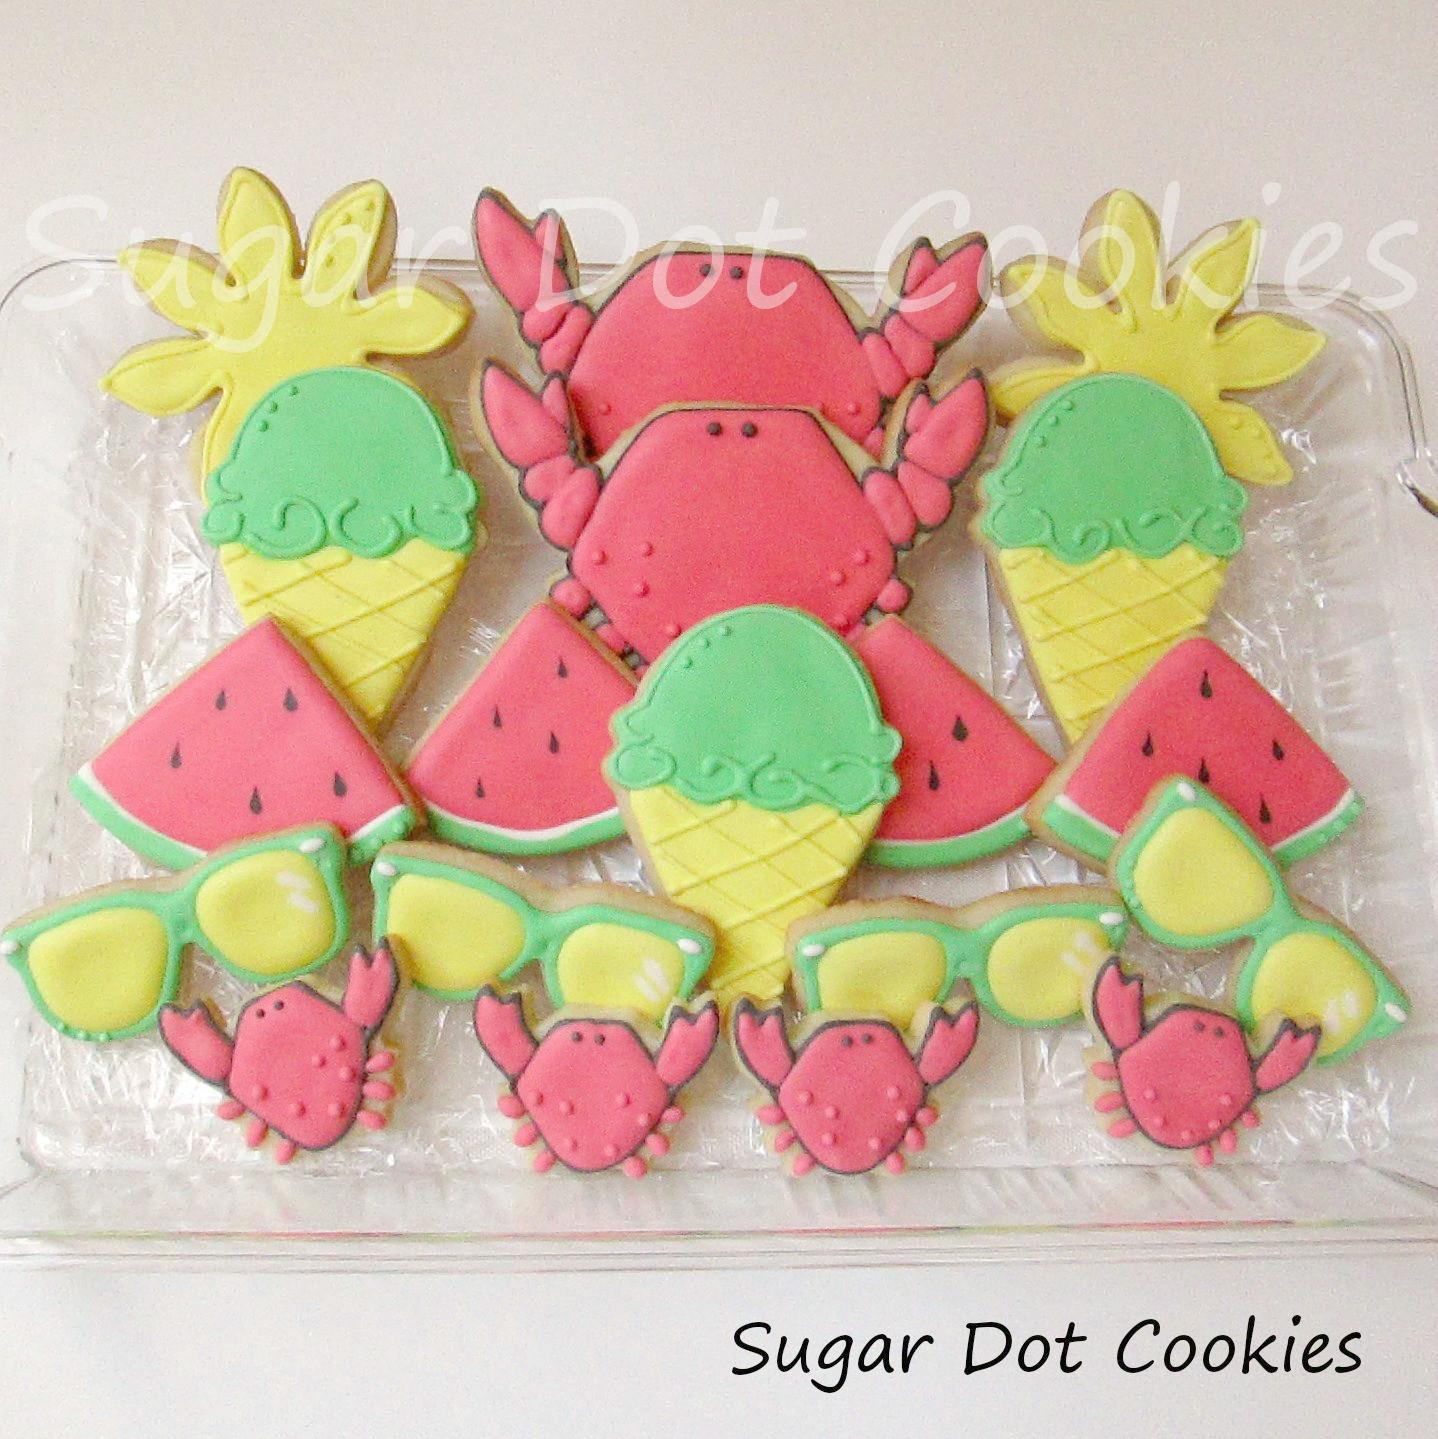 Summer Sugar Cookies  Ice cream cones watermelon wedges sunglasses the sun